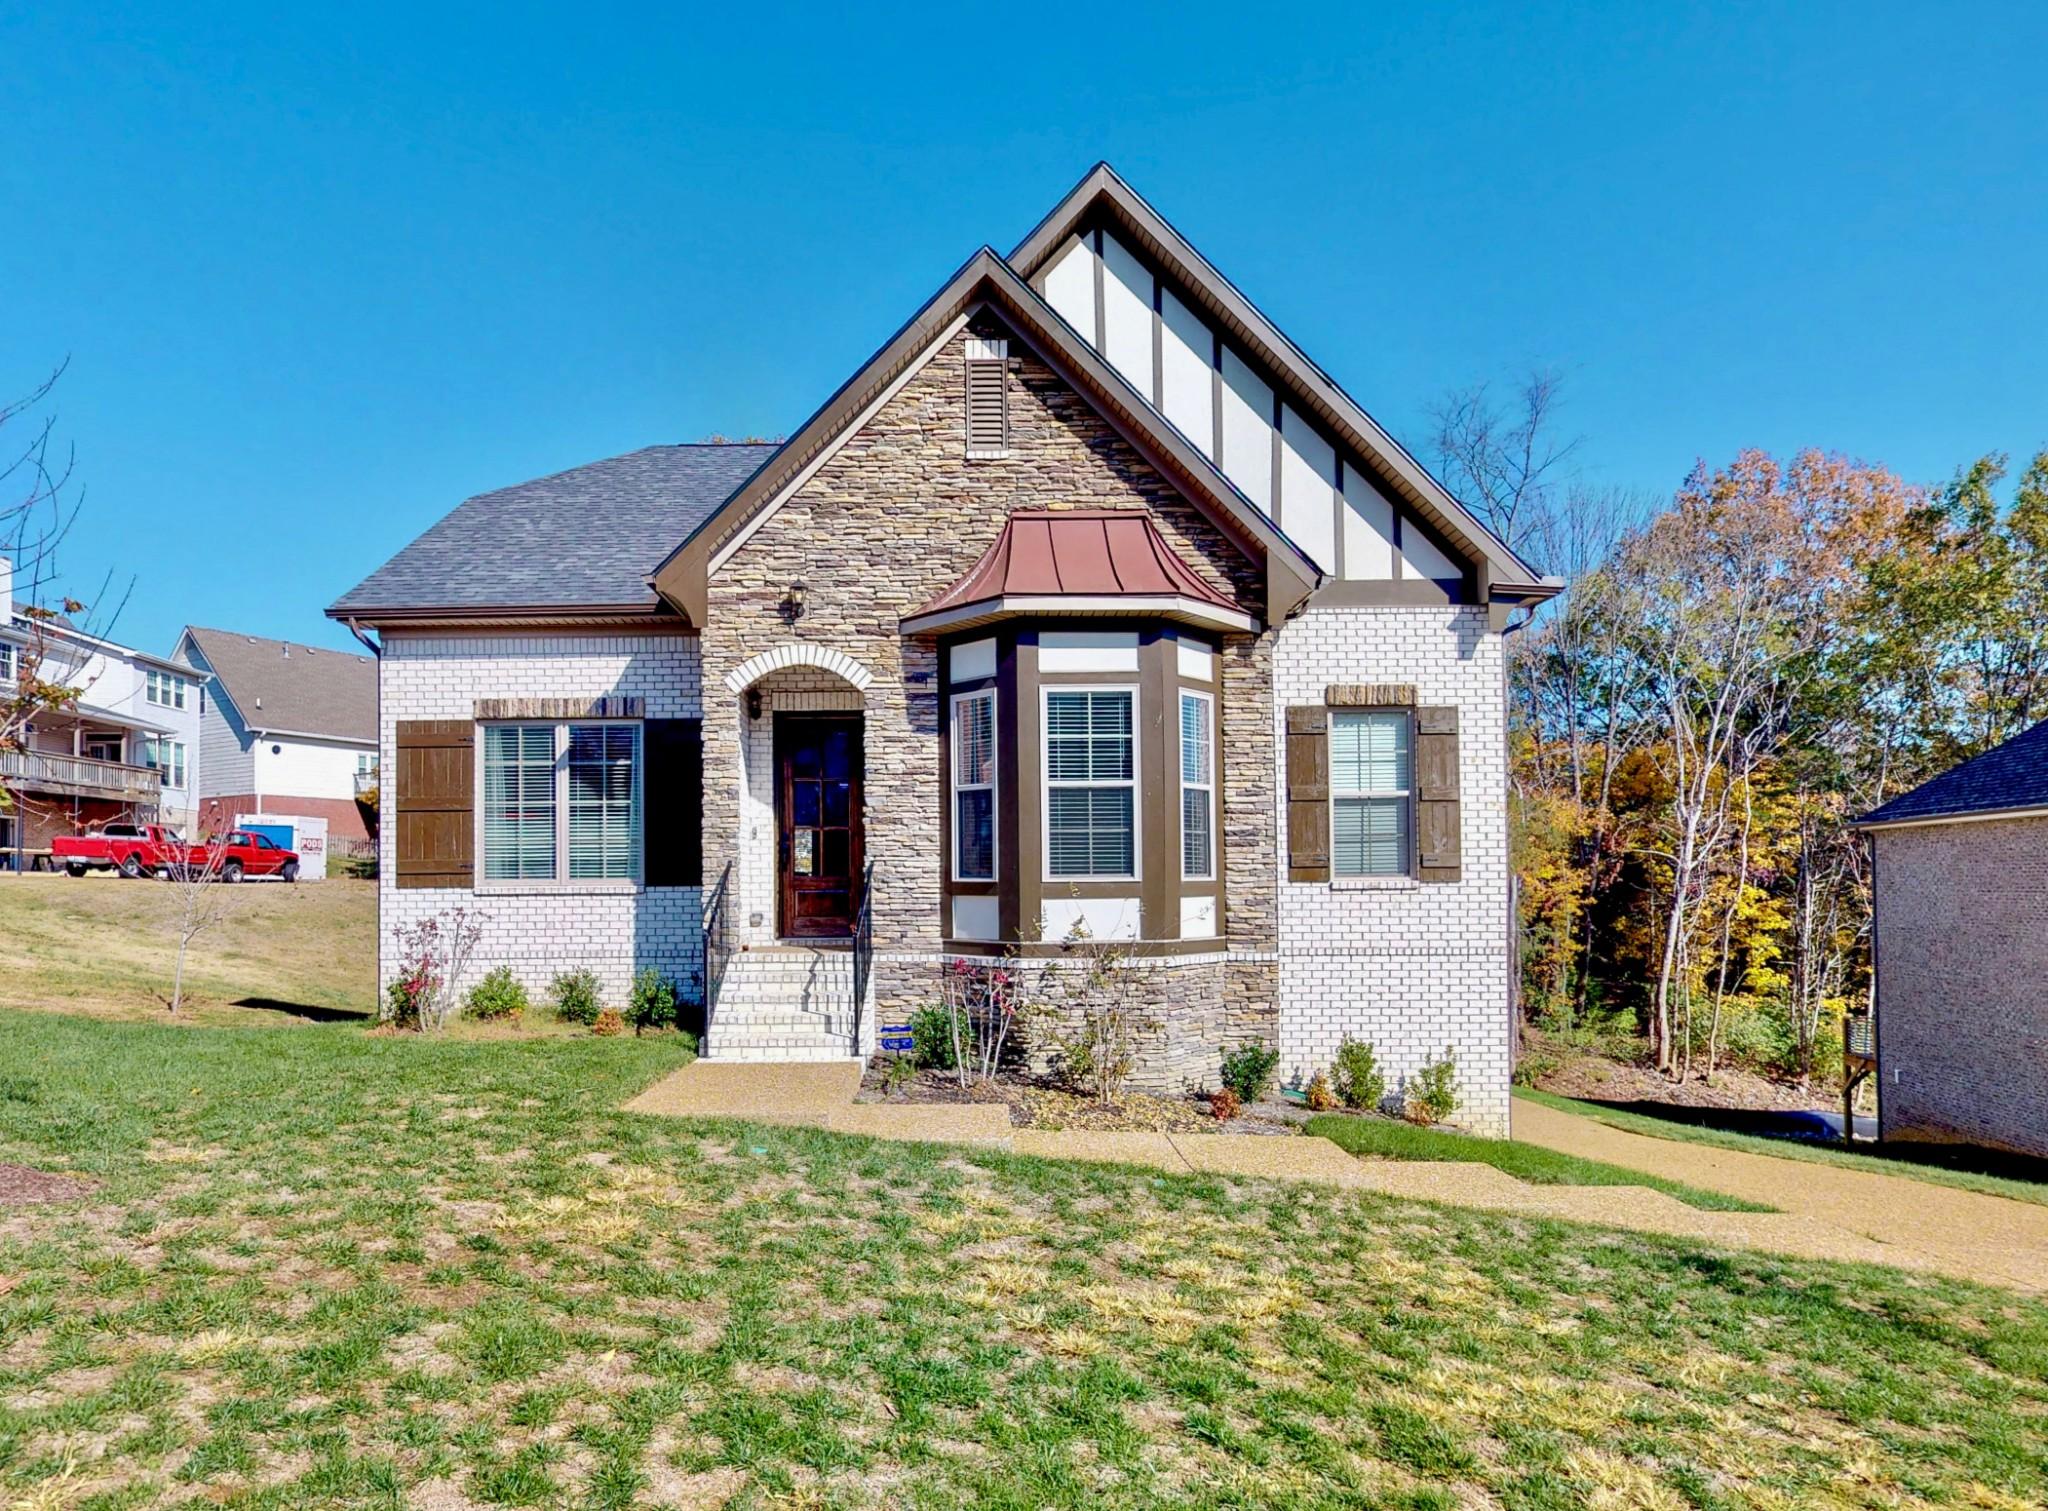 $440,000 - 4Br/4Ba -  for Sale in Pine Ridge Estates, Nashville